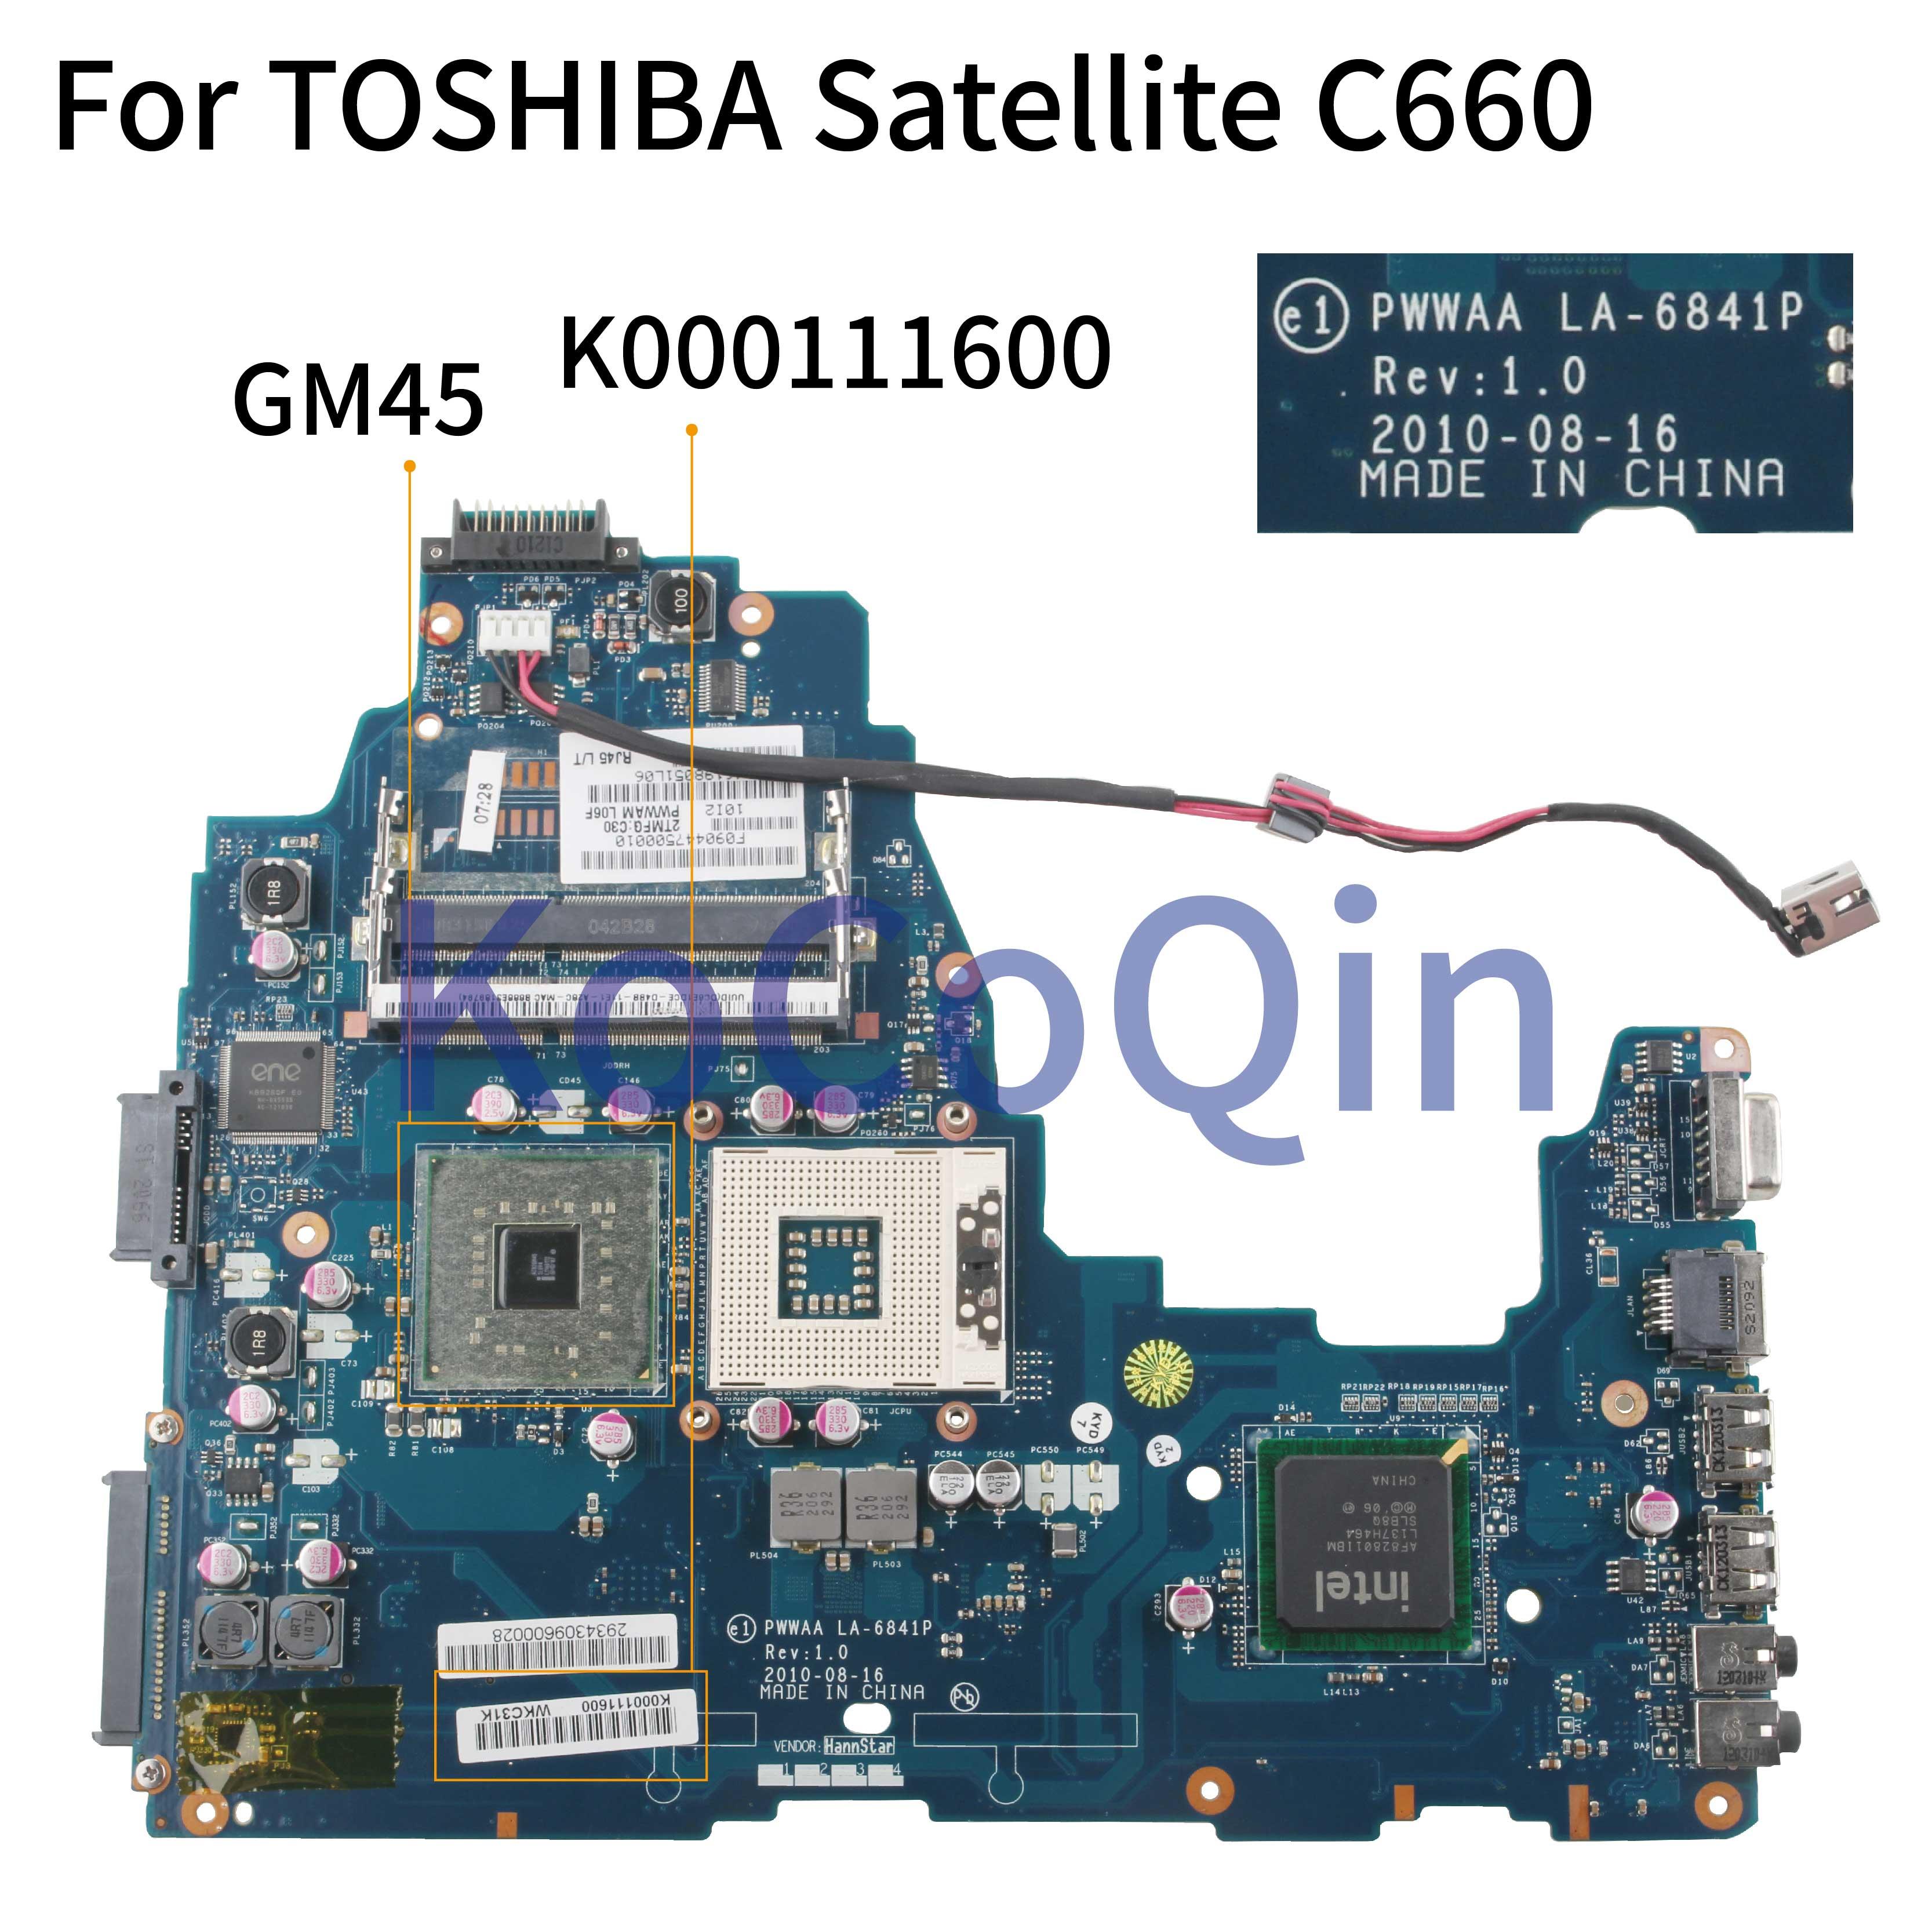 KoCoQin Laptop Motherboard For TOSHIBA Satellite C660 Mainboard PWWAA LA-6841P K000111600 GM45